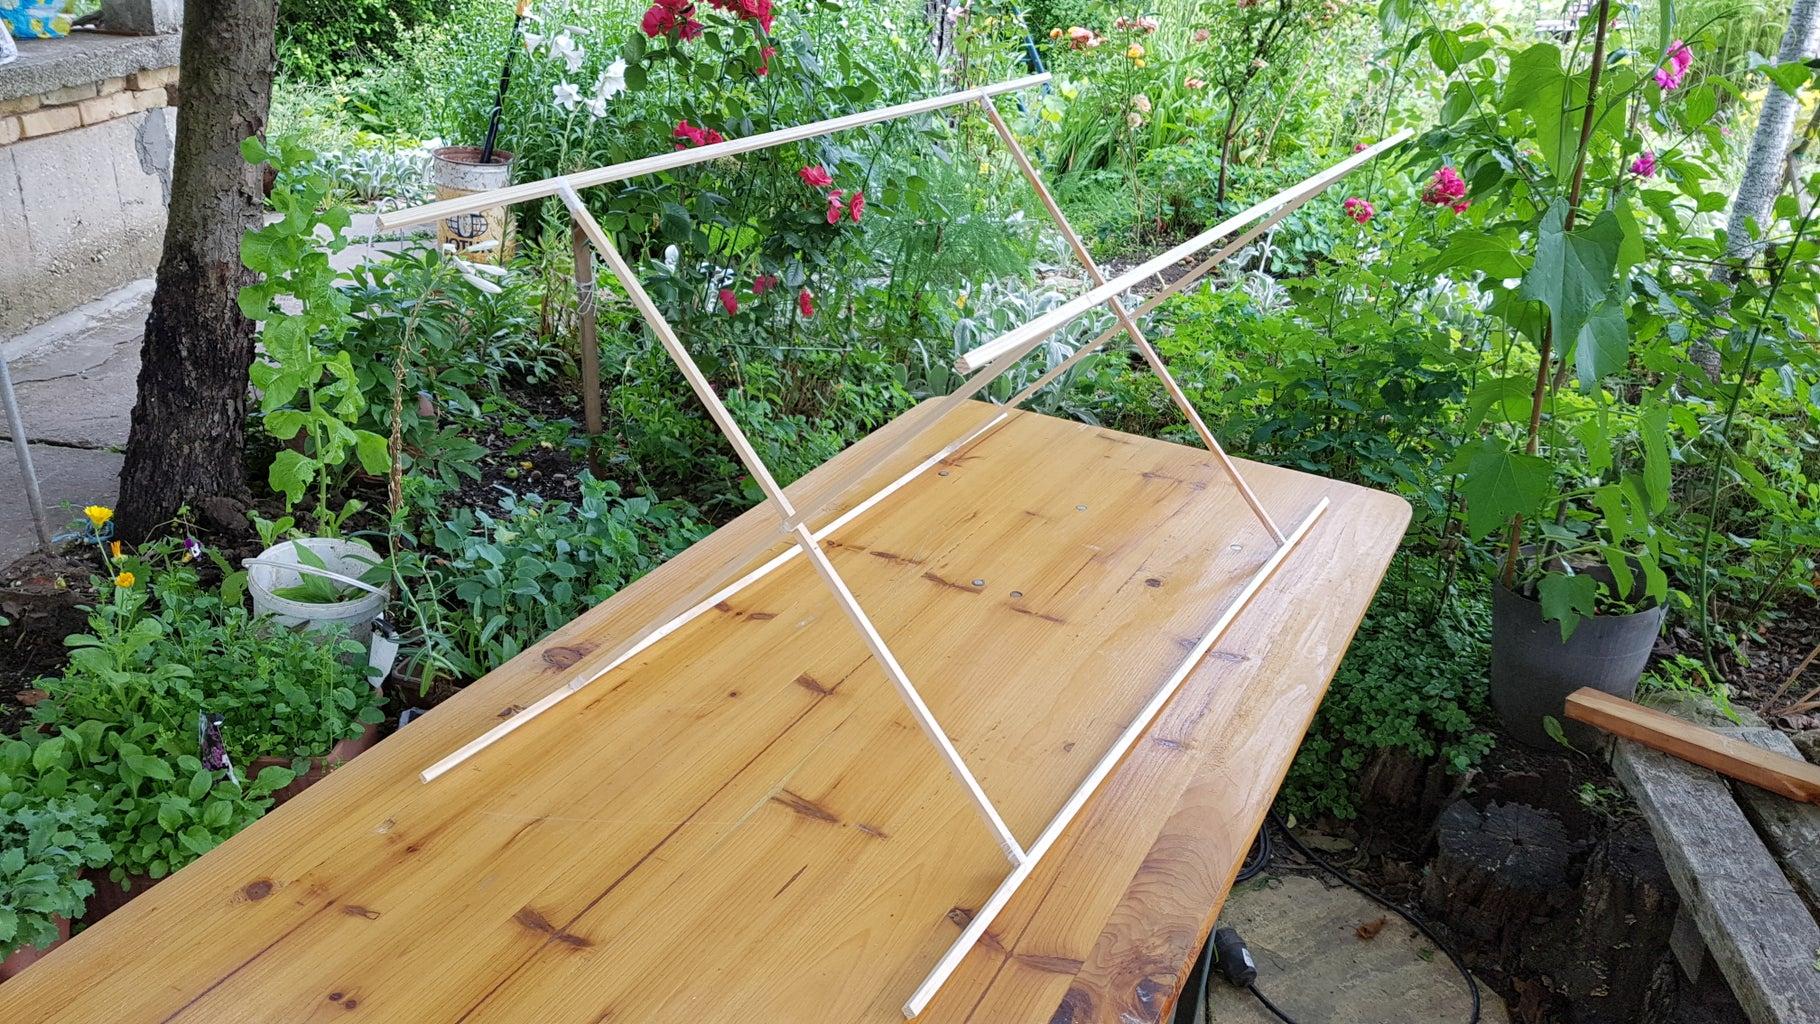 Assemble the Kite's Wooden Frame